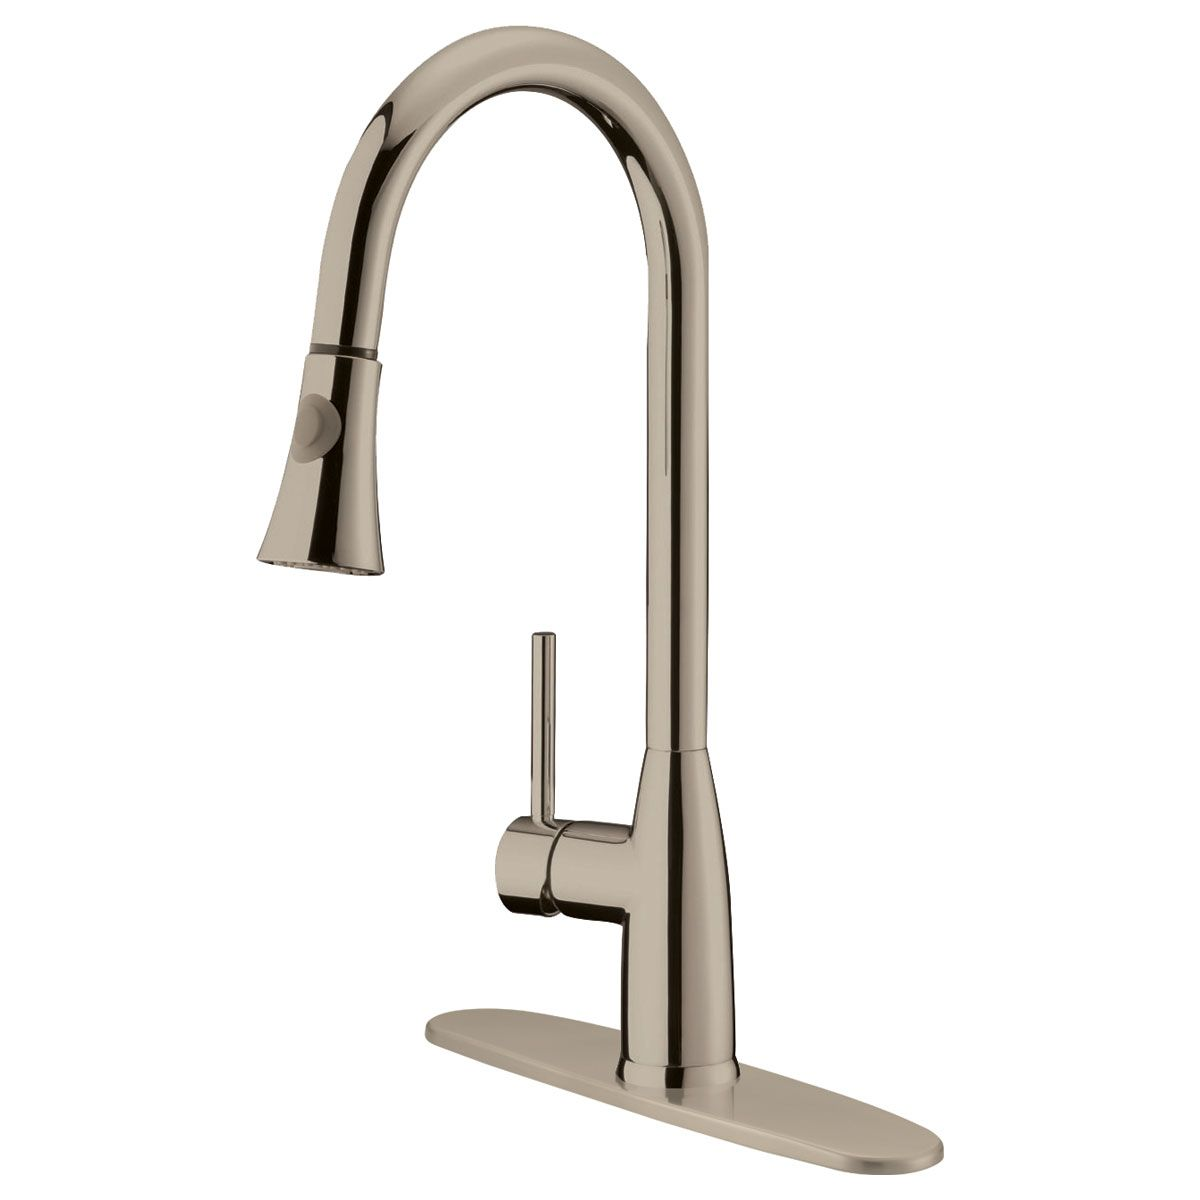 Bathroom Faucets Inch Spread Brushed Nickel Bathroom Design - Bathroom faucets 8 inch spread for bathroom decor ideas